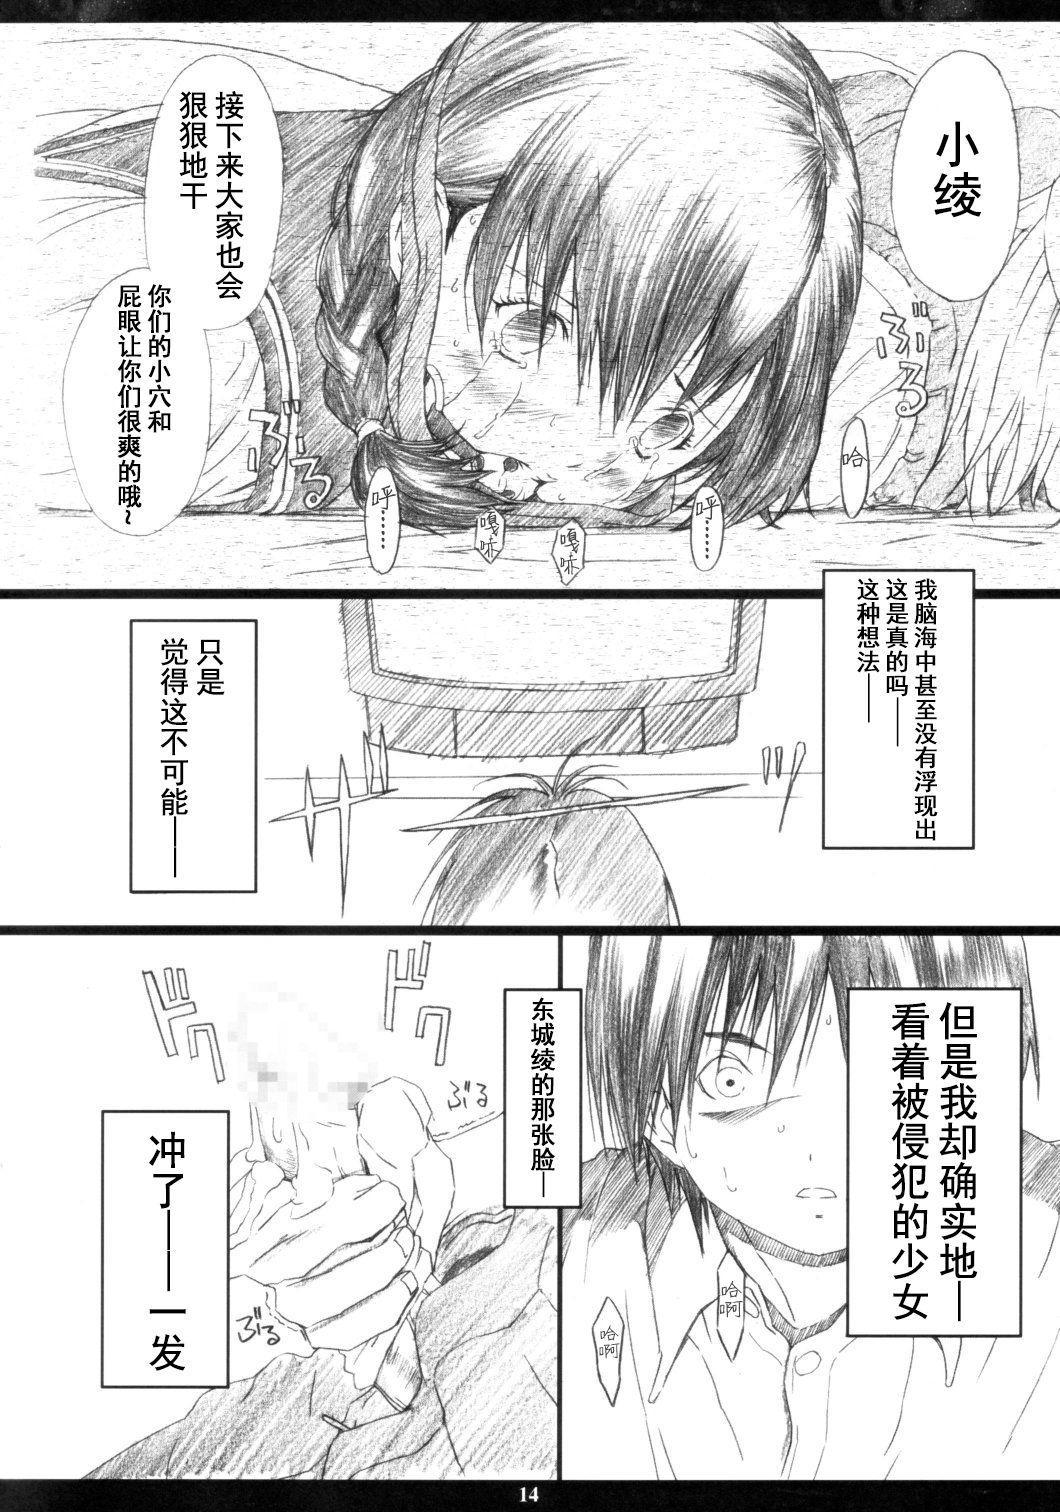 Ichigo MAX% 12